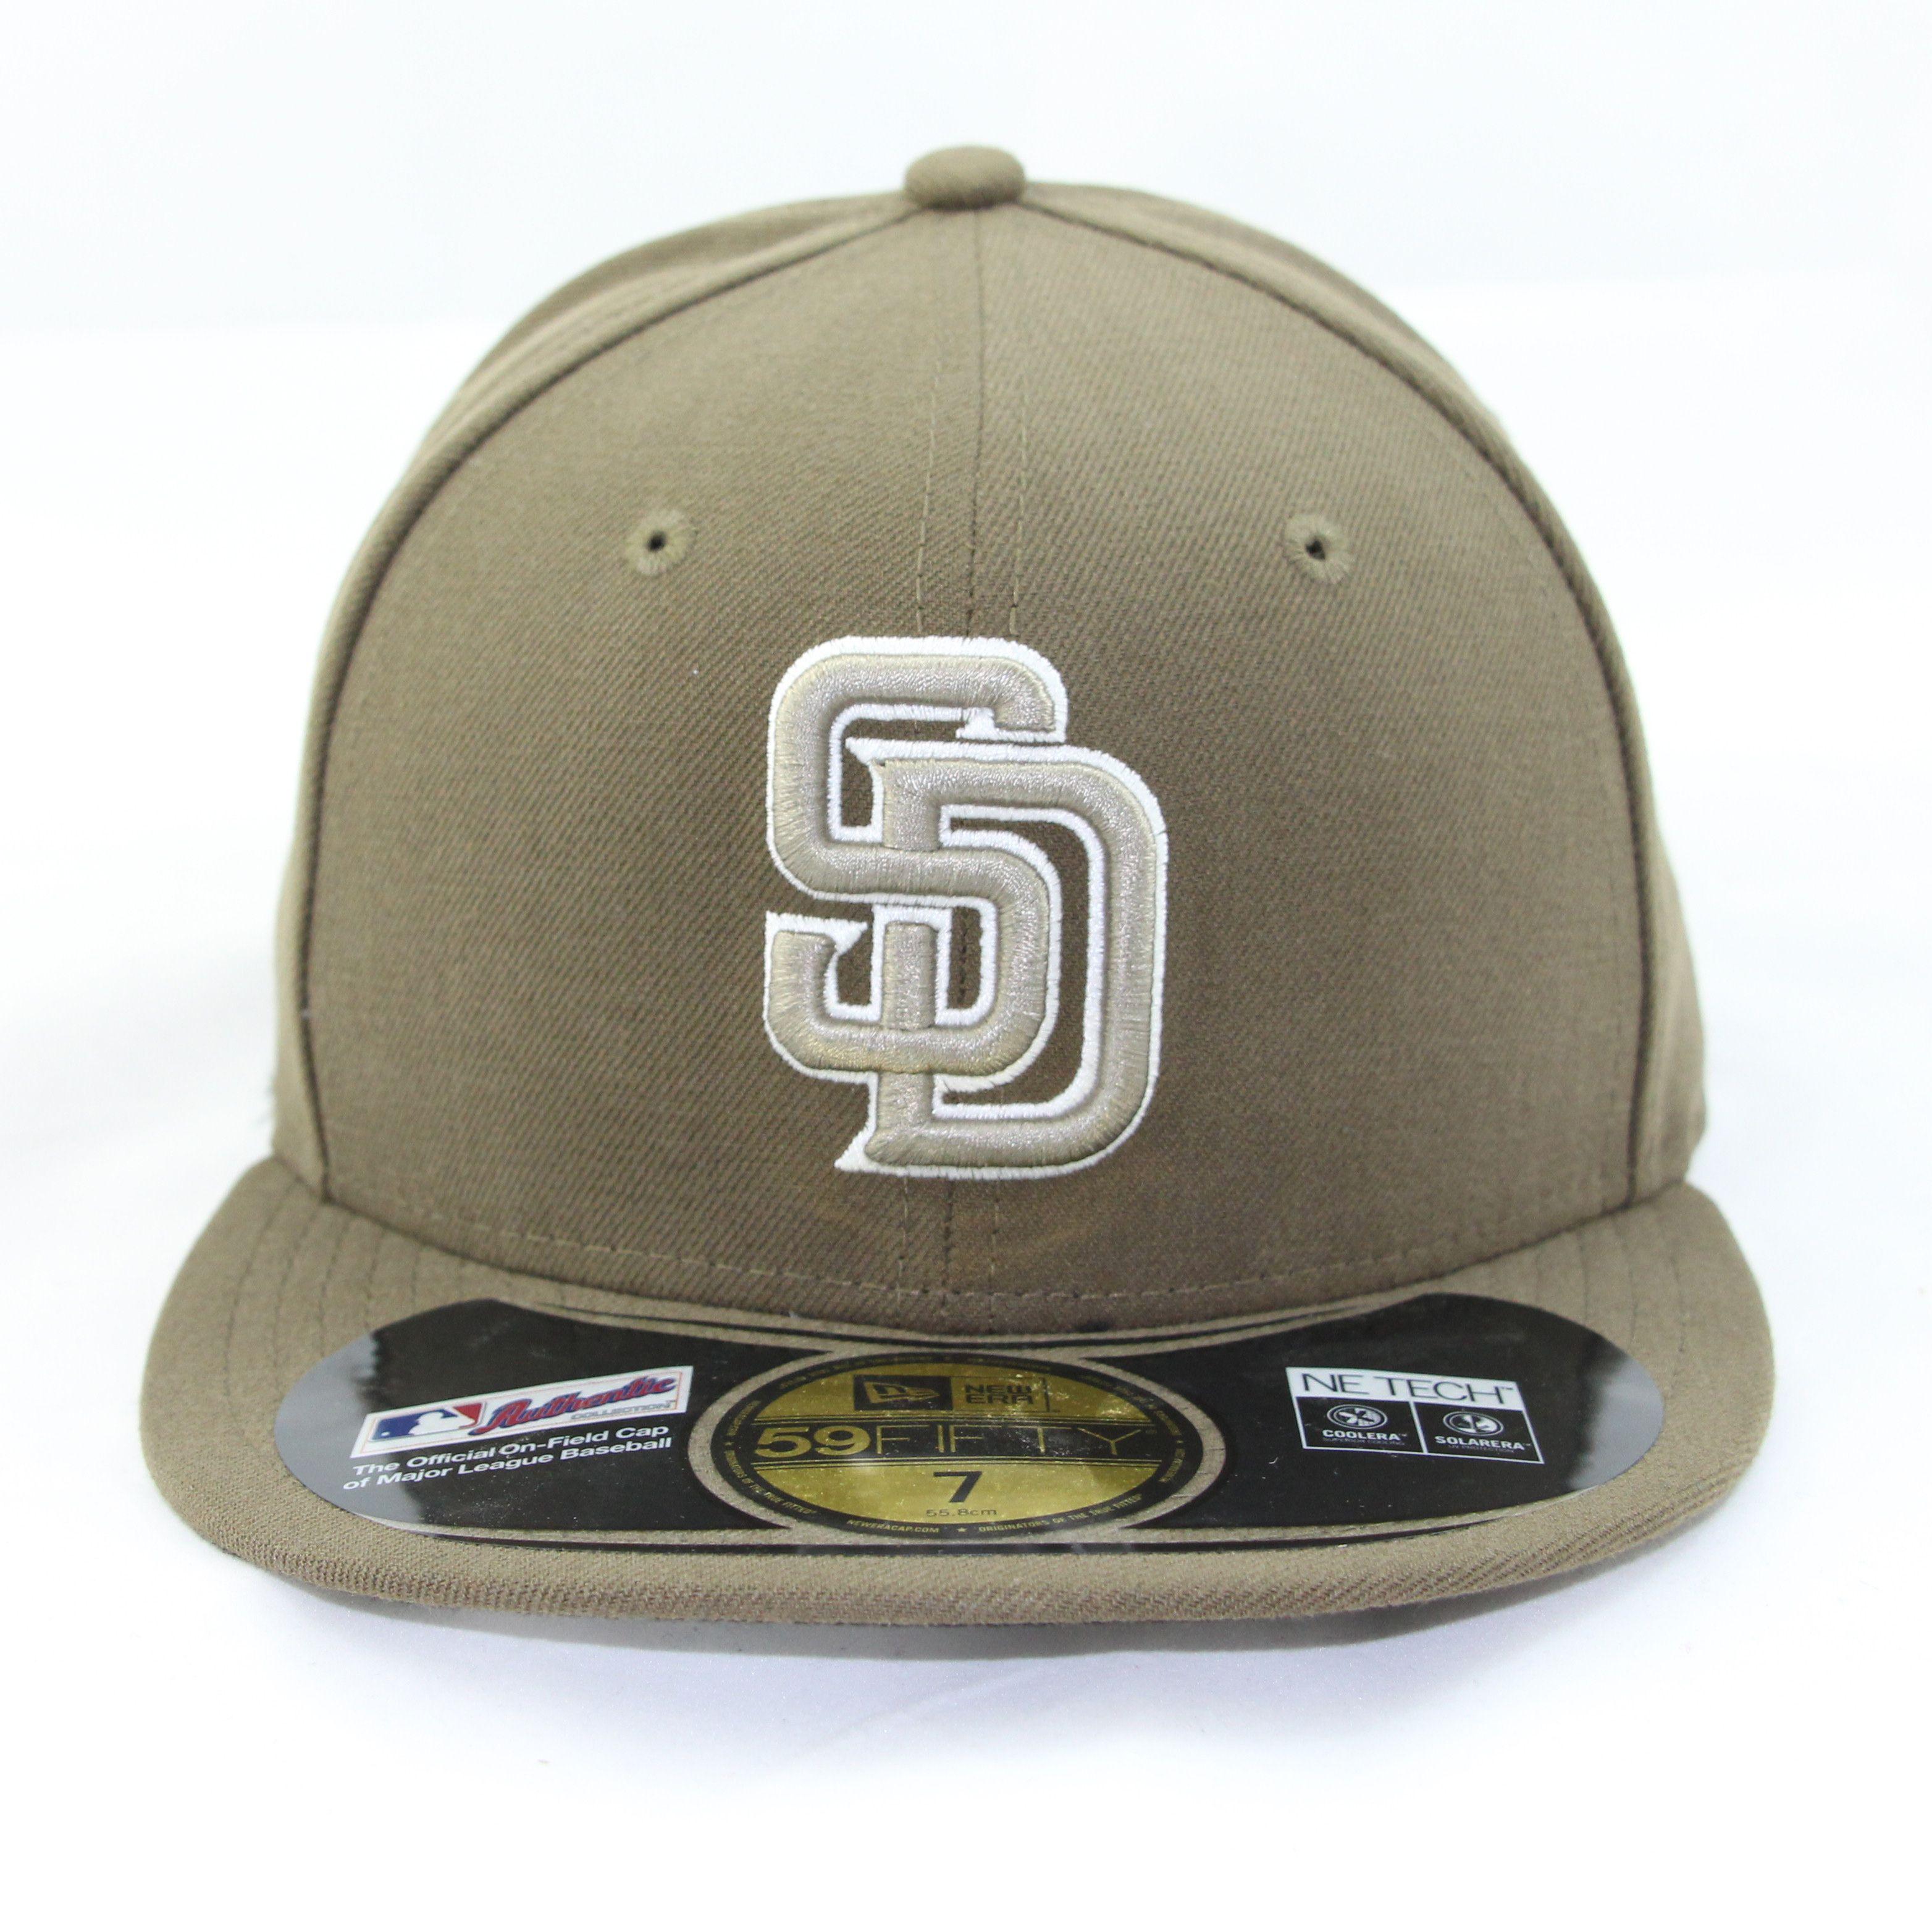 c271943448418 Gorras Originales New Era Beisbol San Diego Padres 59fifty -   569.00